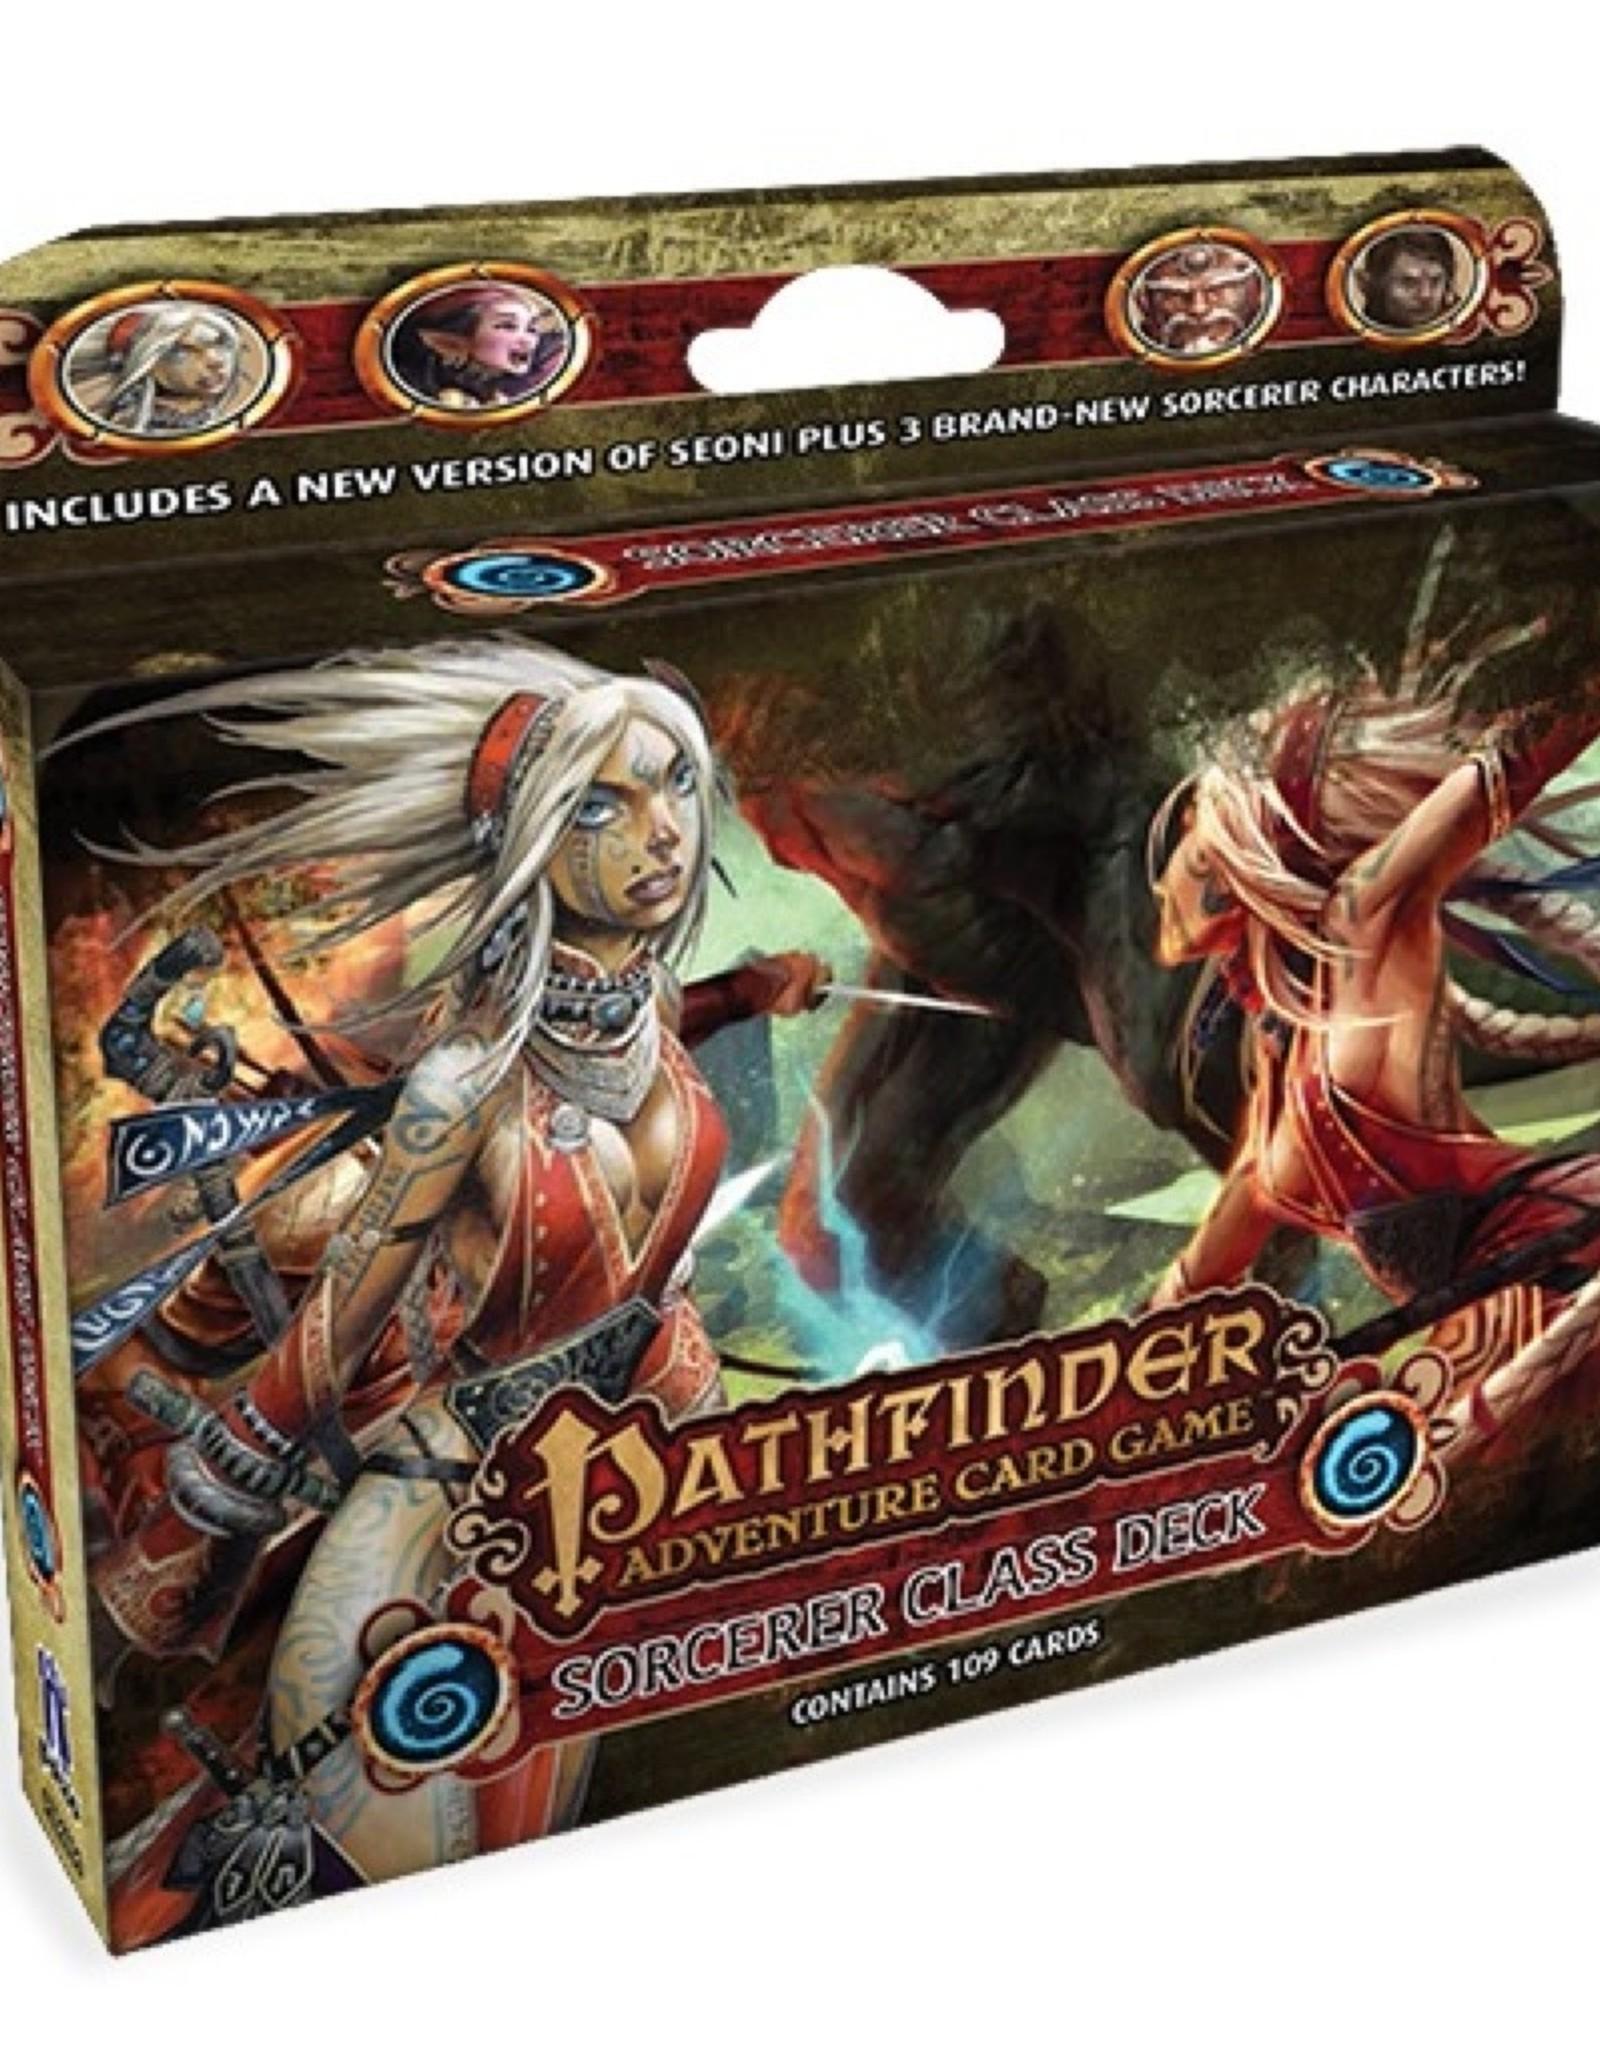 Paizo Pathfinder Adventure Card Game: Sorcerer Class Deck